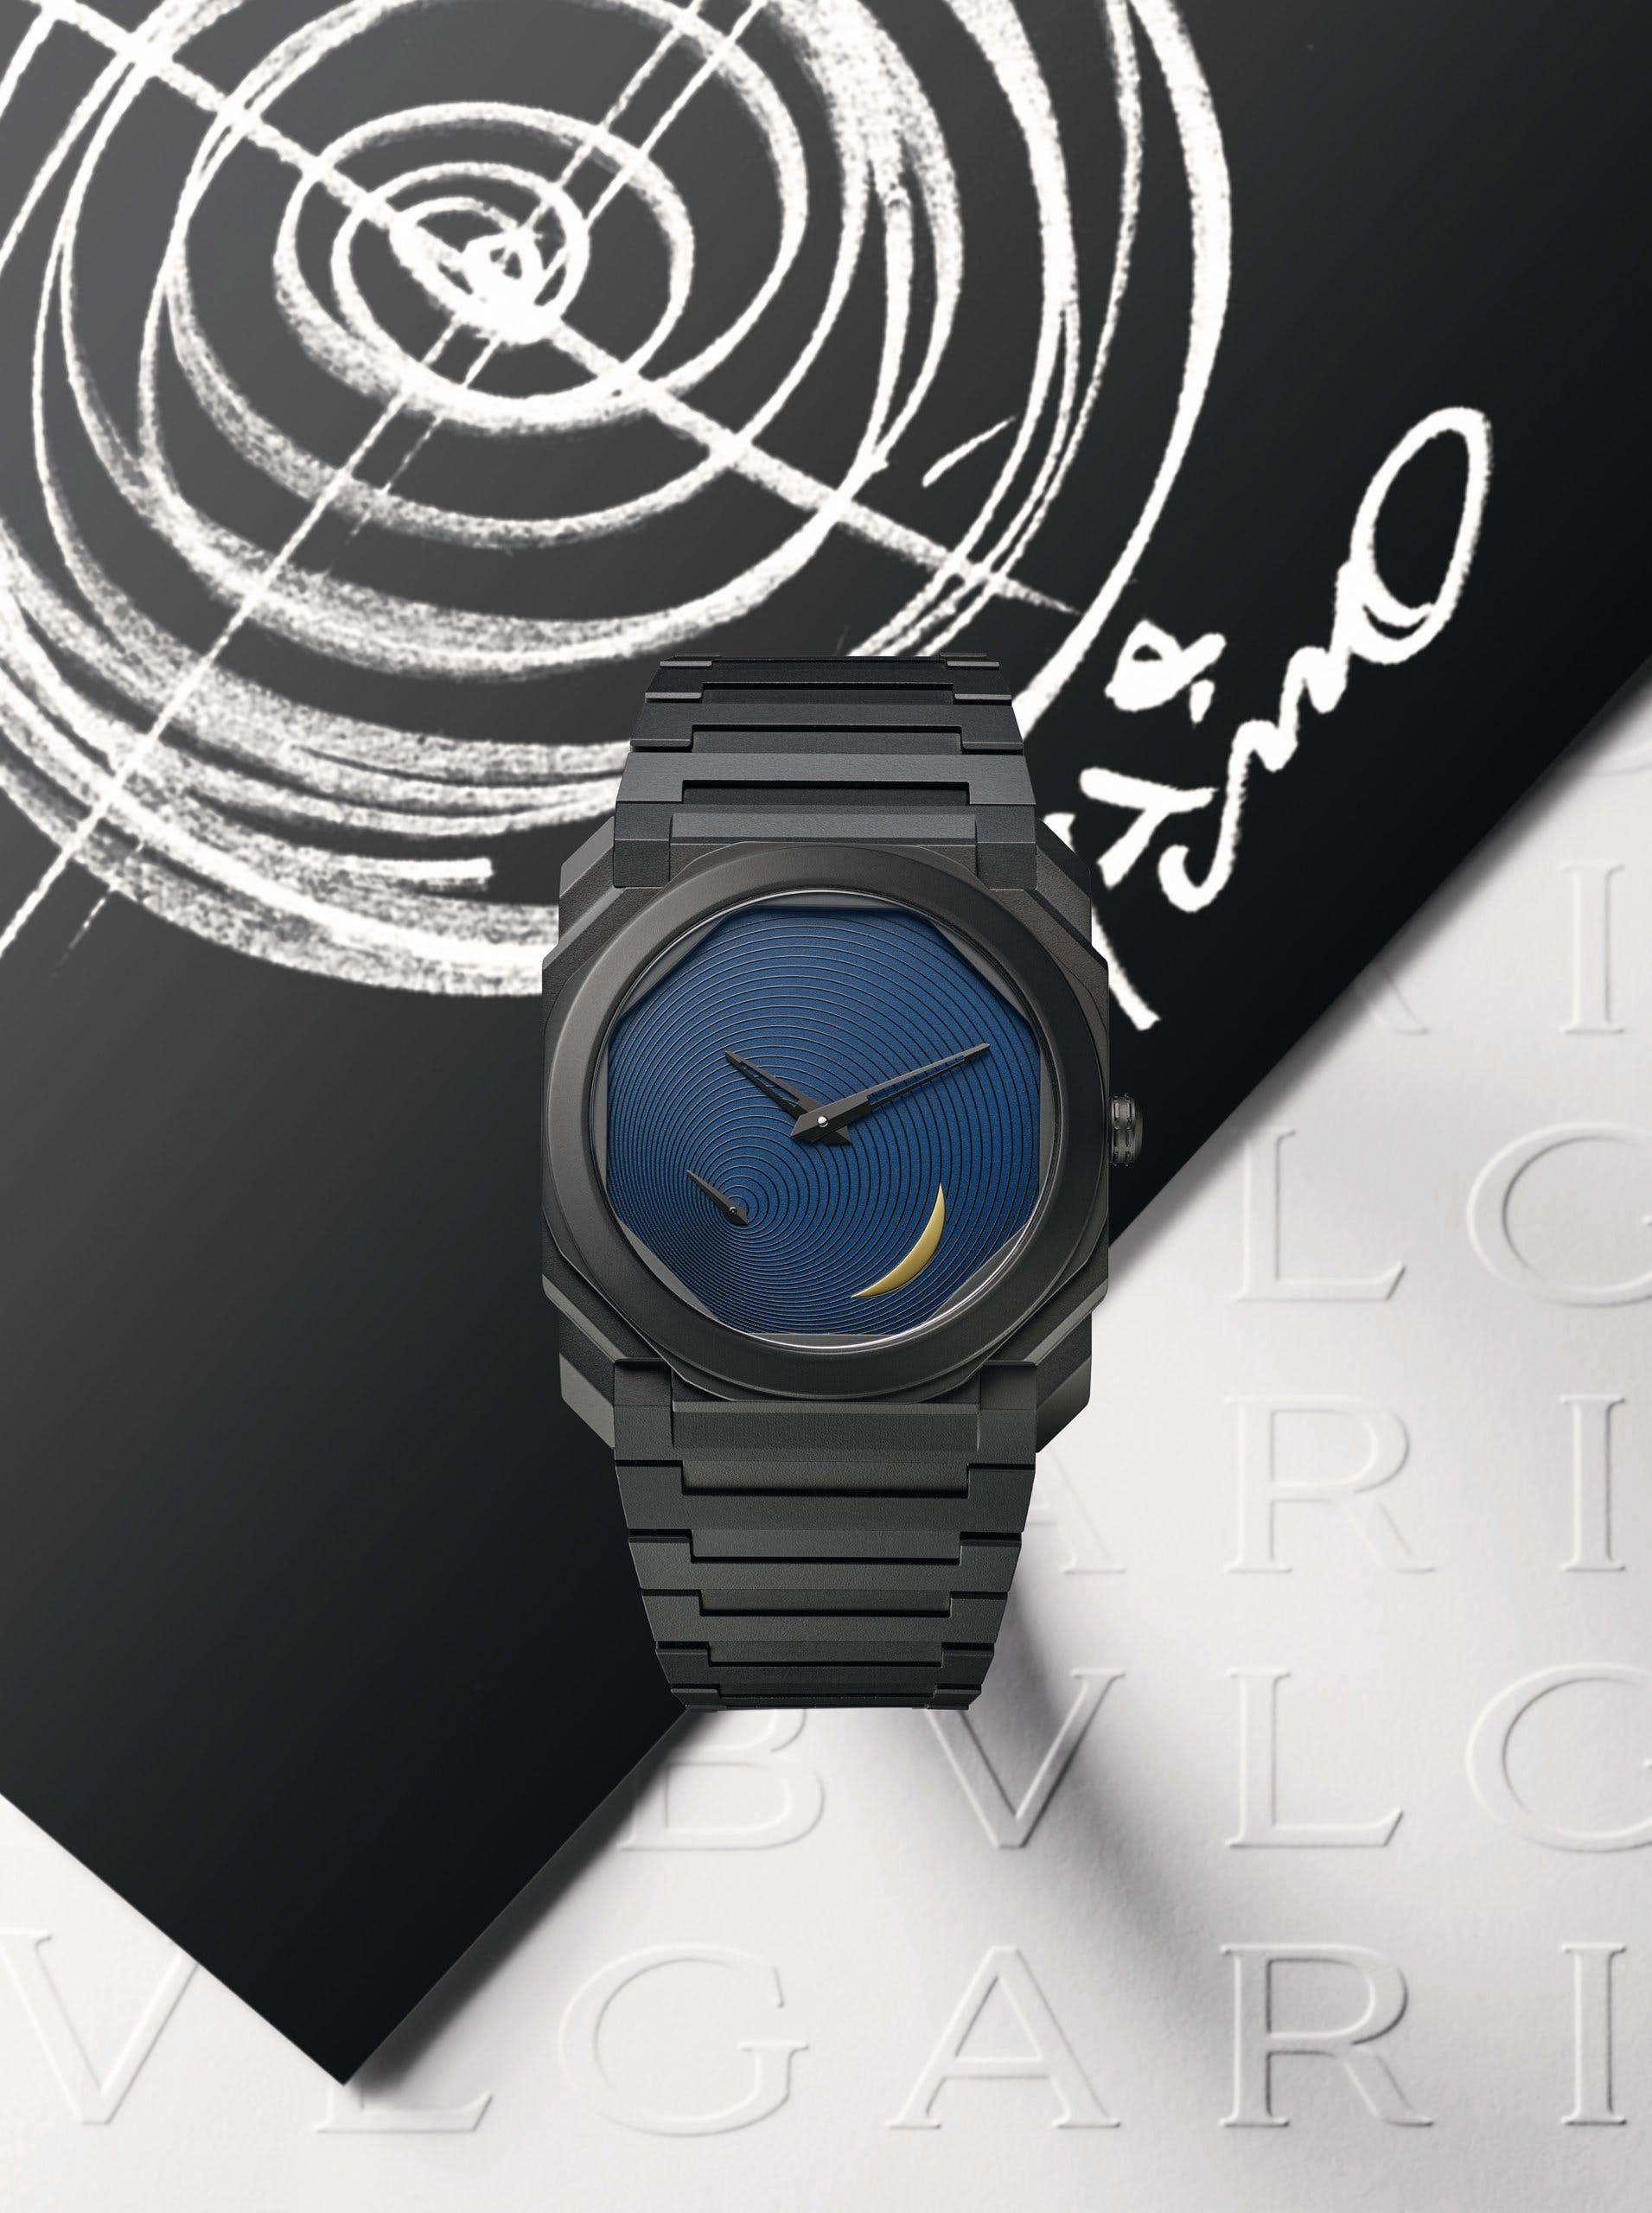 Bvlgari Octo Finissimo Tadao Ando Limited Edition